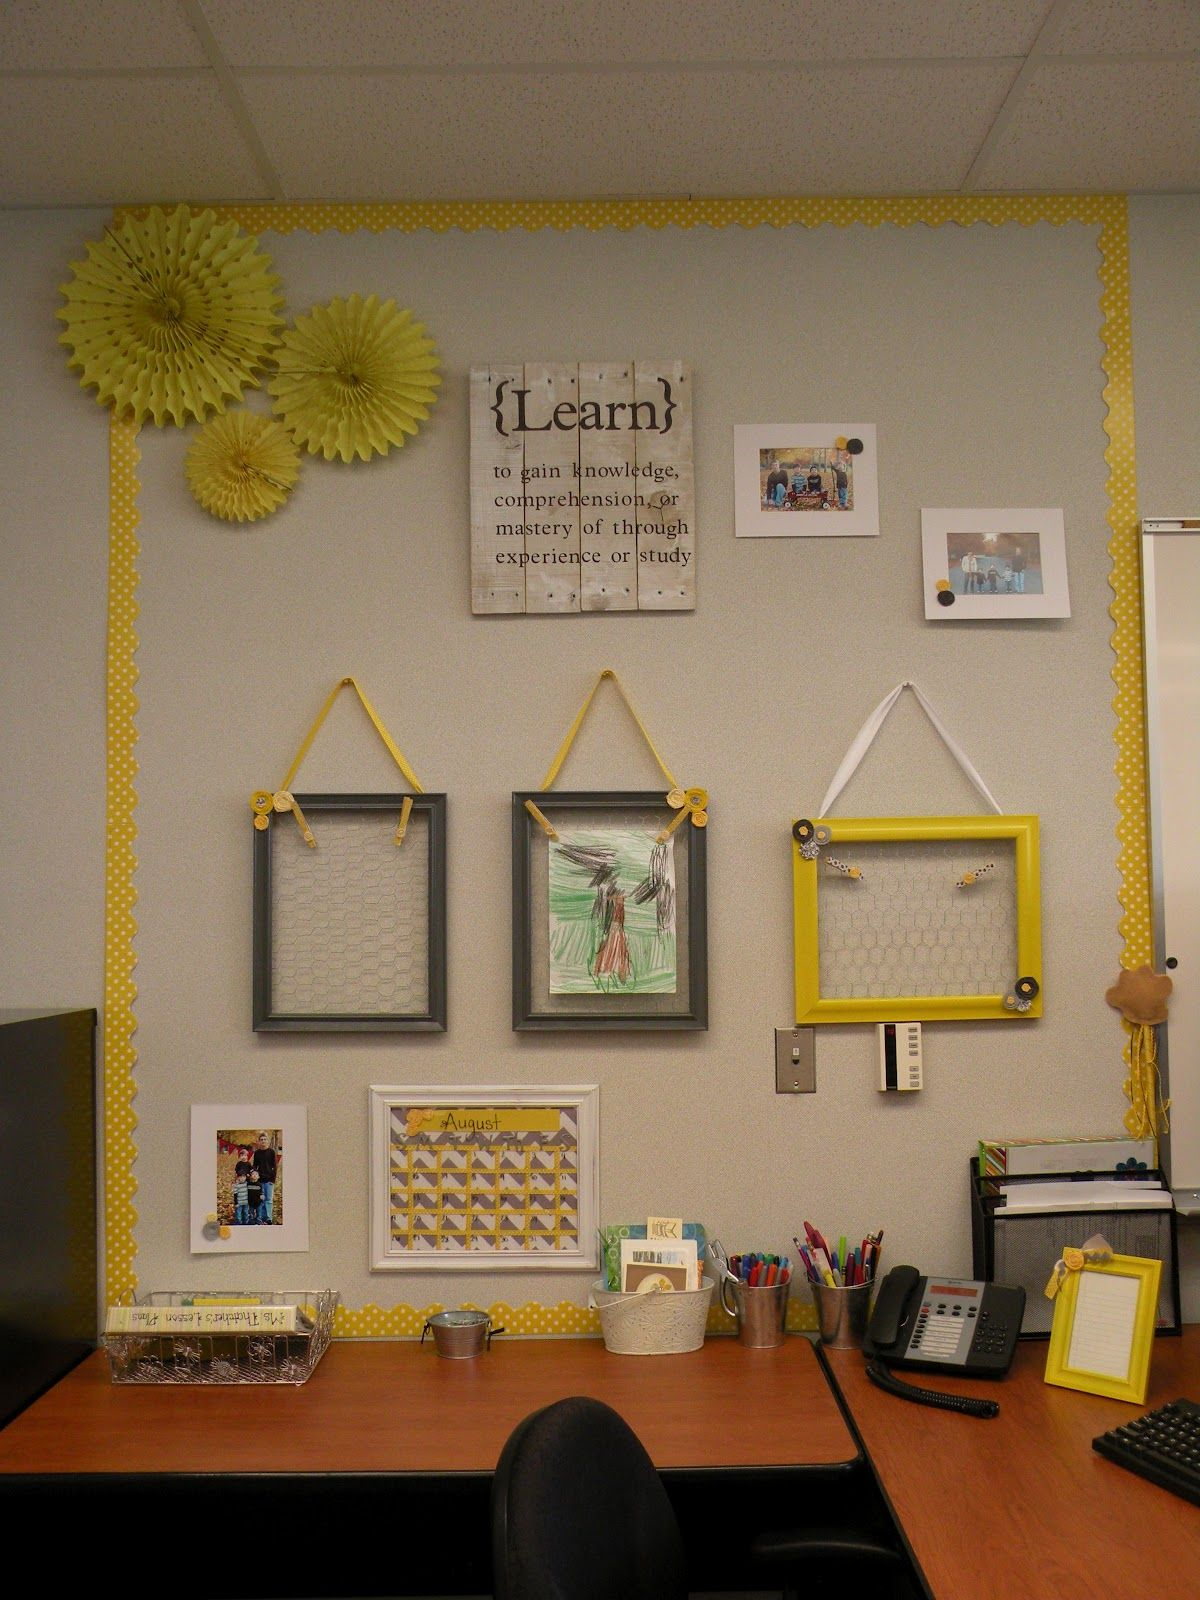 Chic Classroom Style Shabby Chic Classroom Classroom Decor Classroom Style